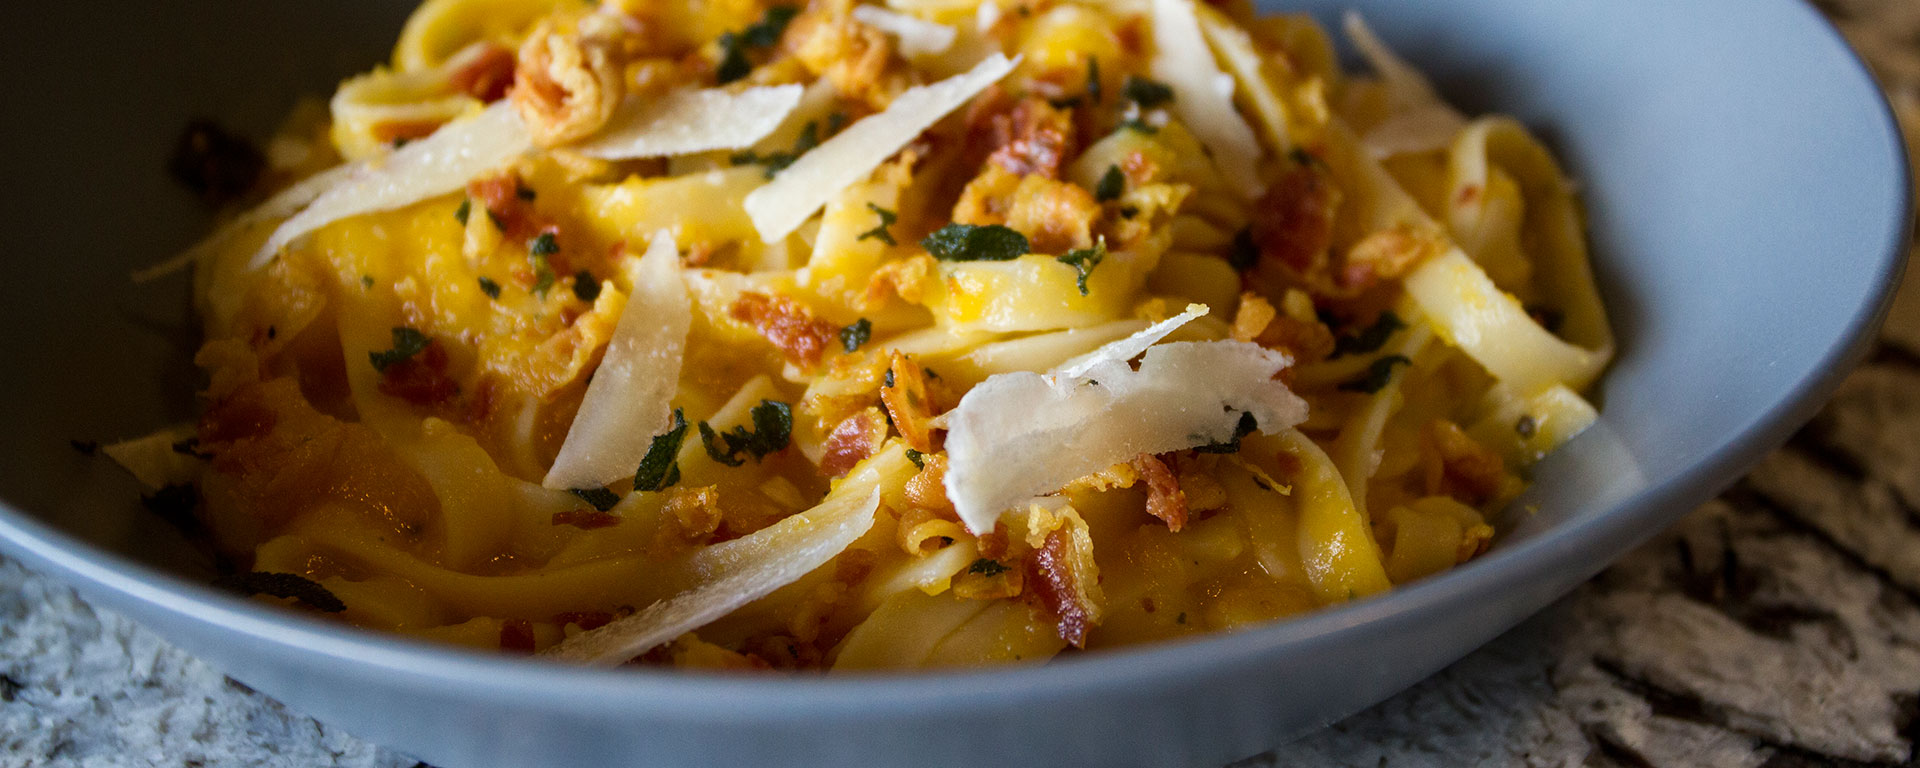 POLYWORLD-Blog-Winter-Squash-Carbonara-Pasta-FEATURED